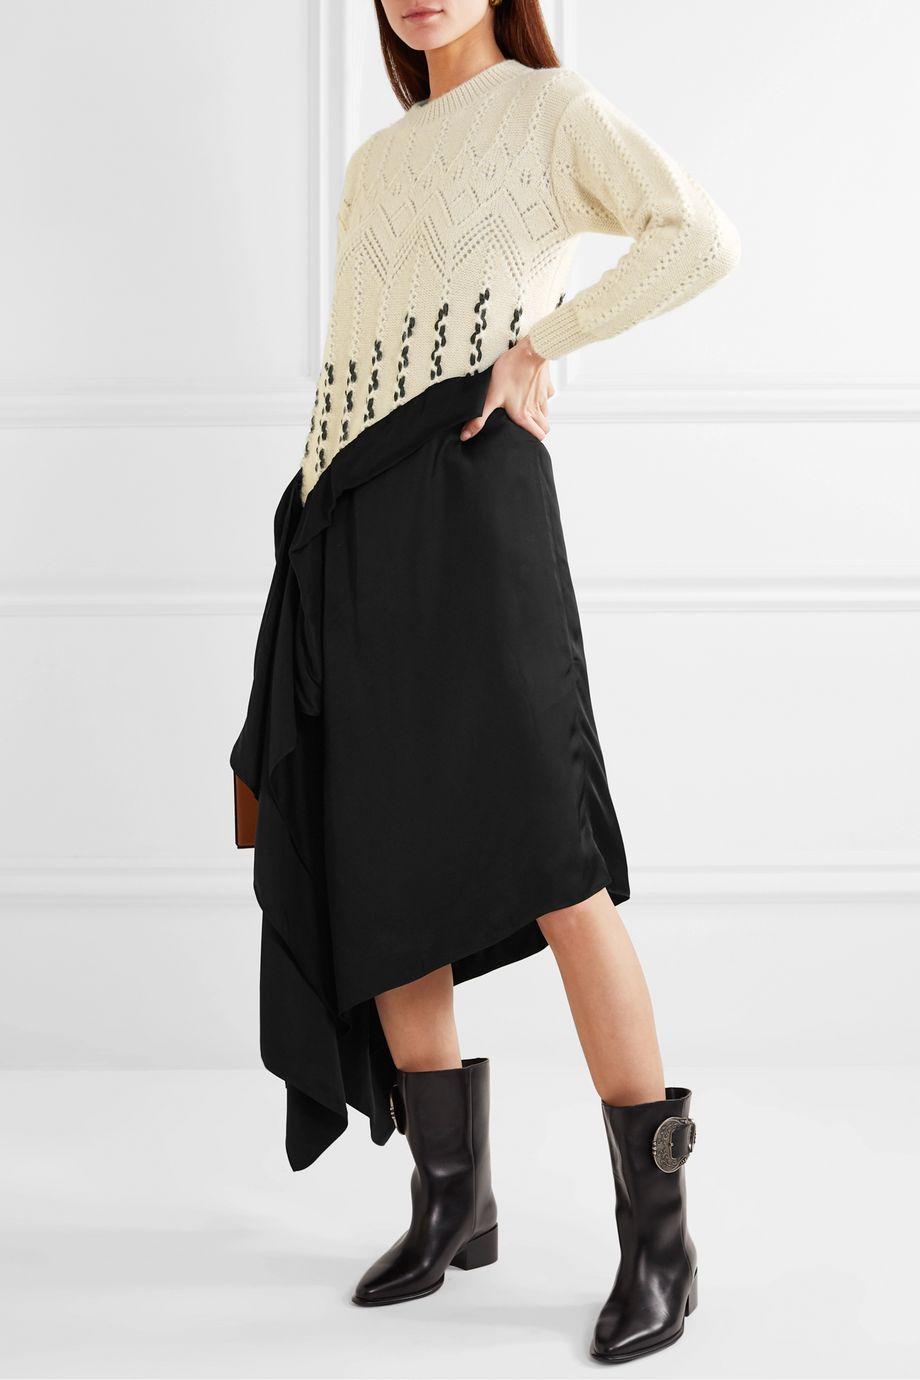 Loewe Asymmetric paneled wool and alpaca-blend and satin midi dress